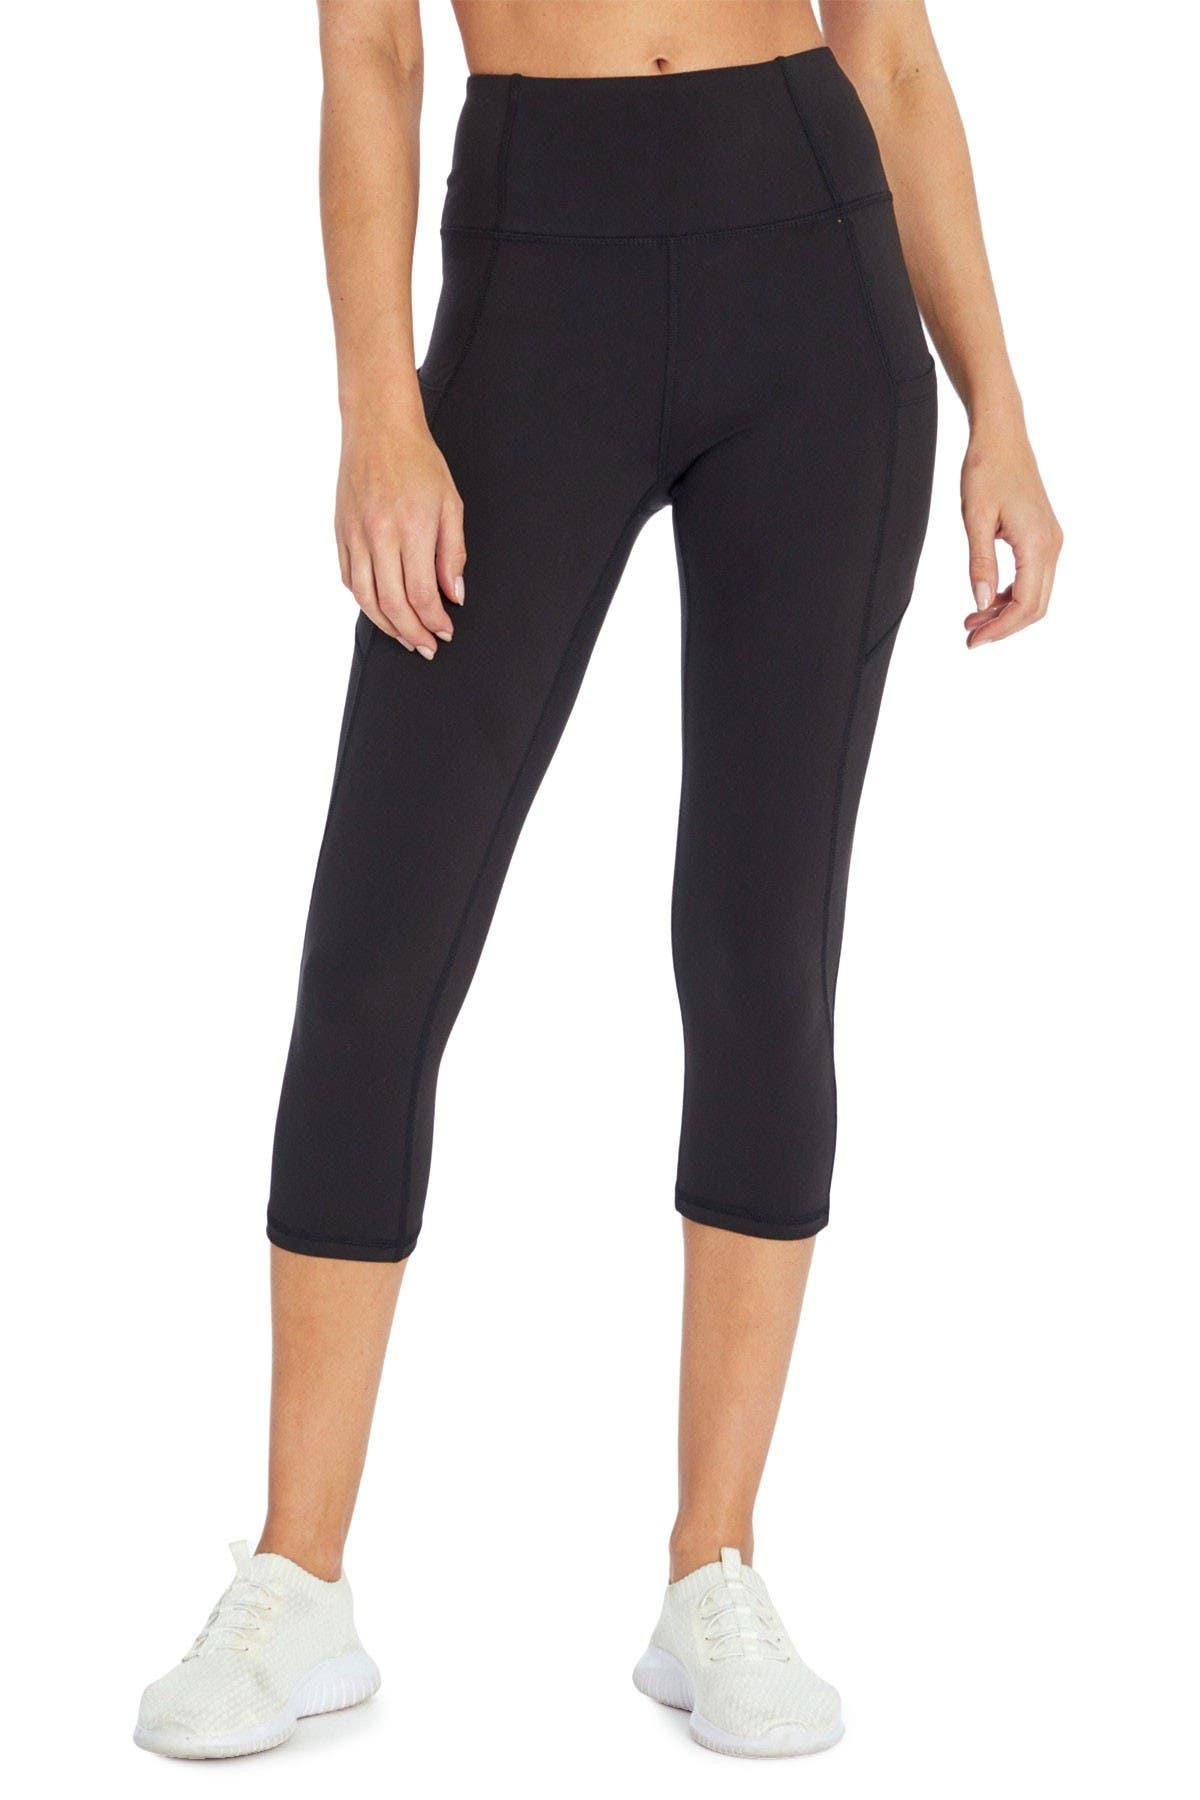 Jessica Simpson Sportswear Womens Tummy Control Pocket Capri Legging